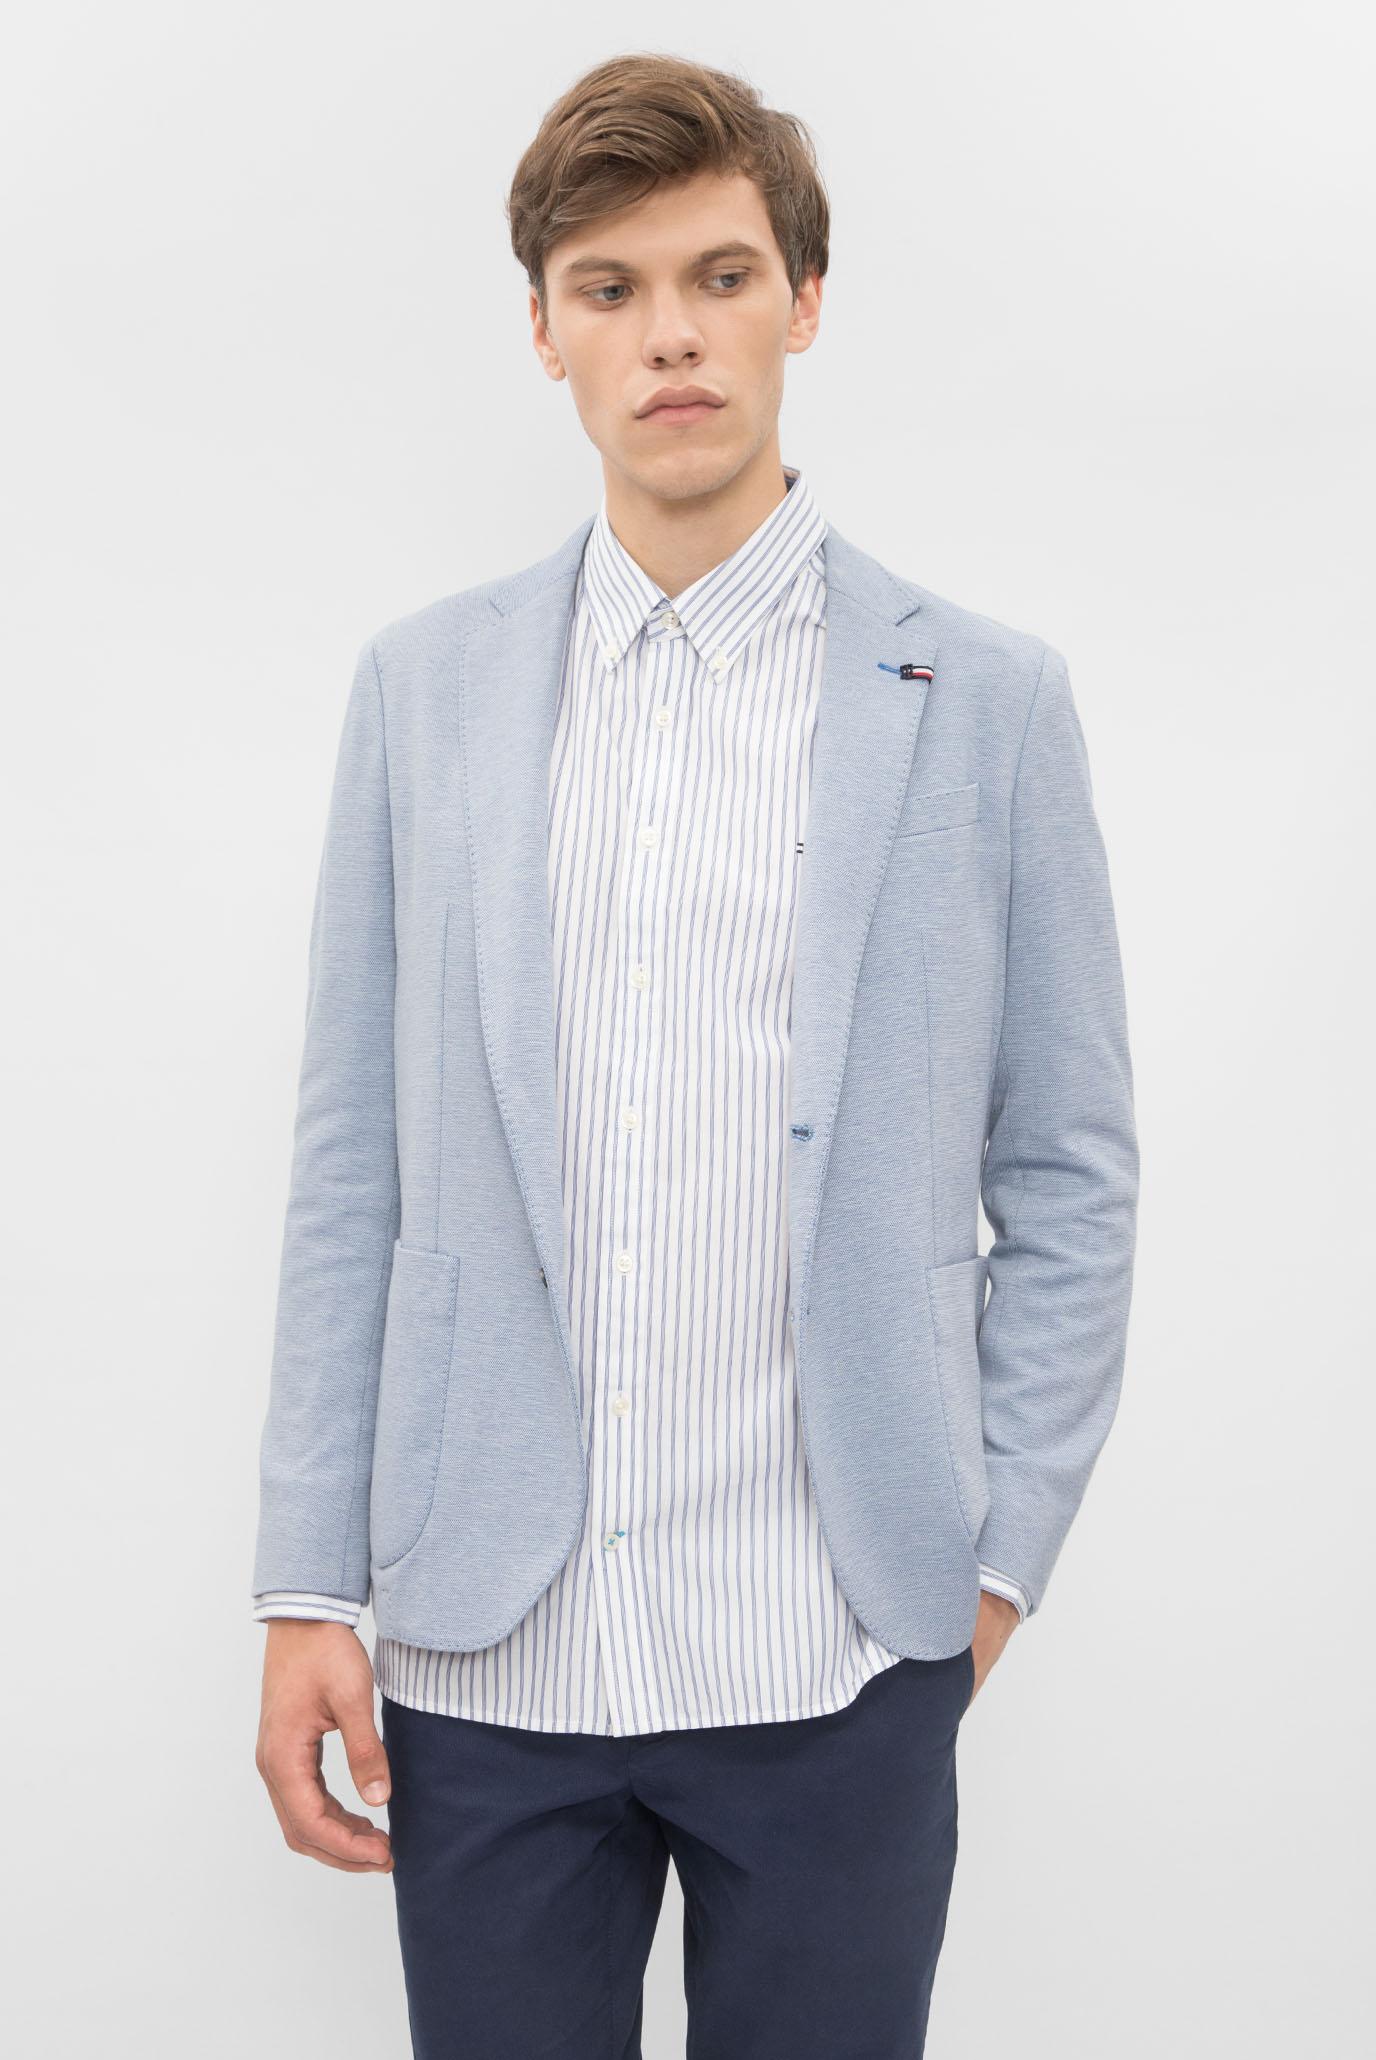 1c33951099e7 Купить Мужской голубой пиджак Tommy Hilfiger Tommy Hilfiger MW0MW00532 –  Киев, Украина. Цены в интернет магазине MD Fashion